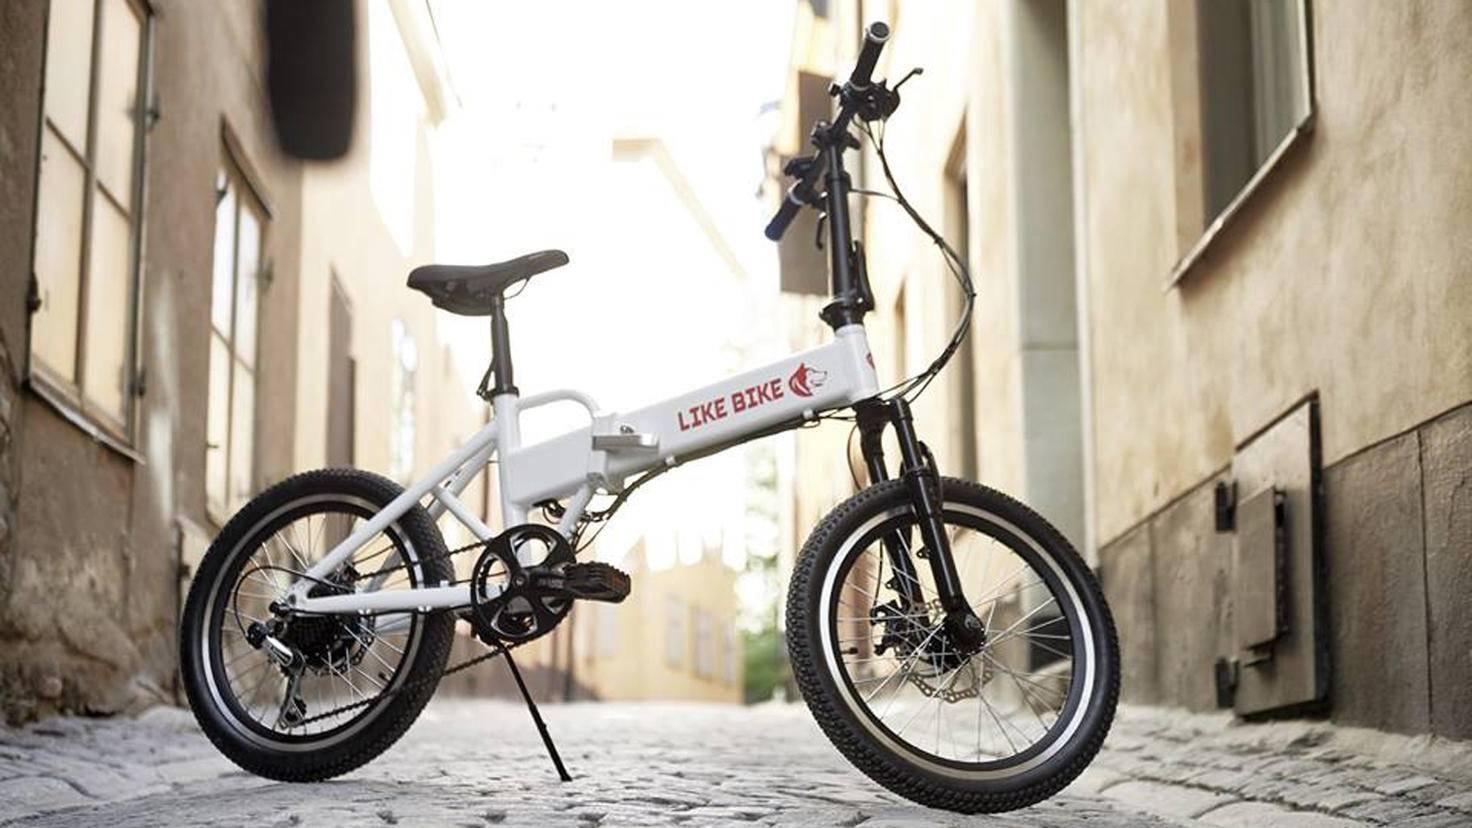 Like Bike-Facebook-likebikeofficial